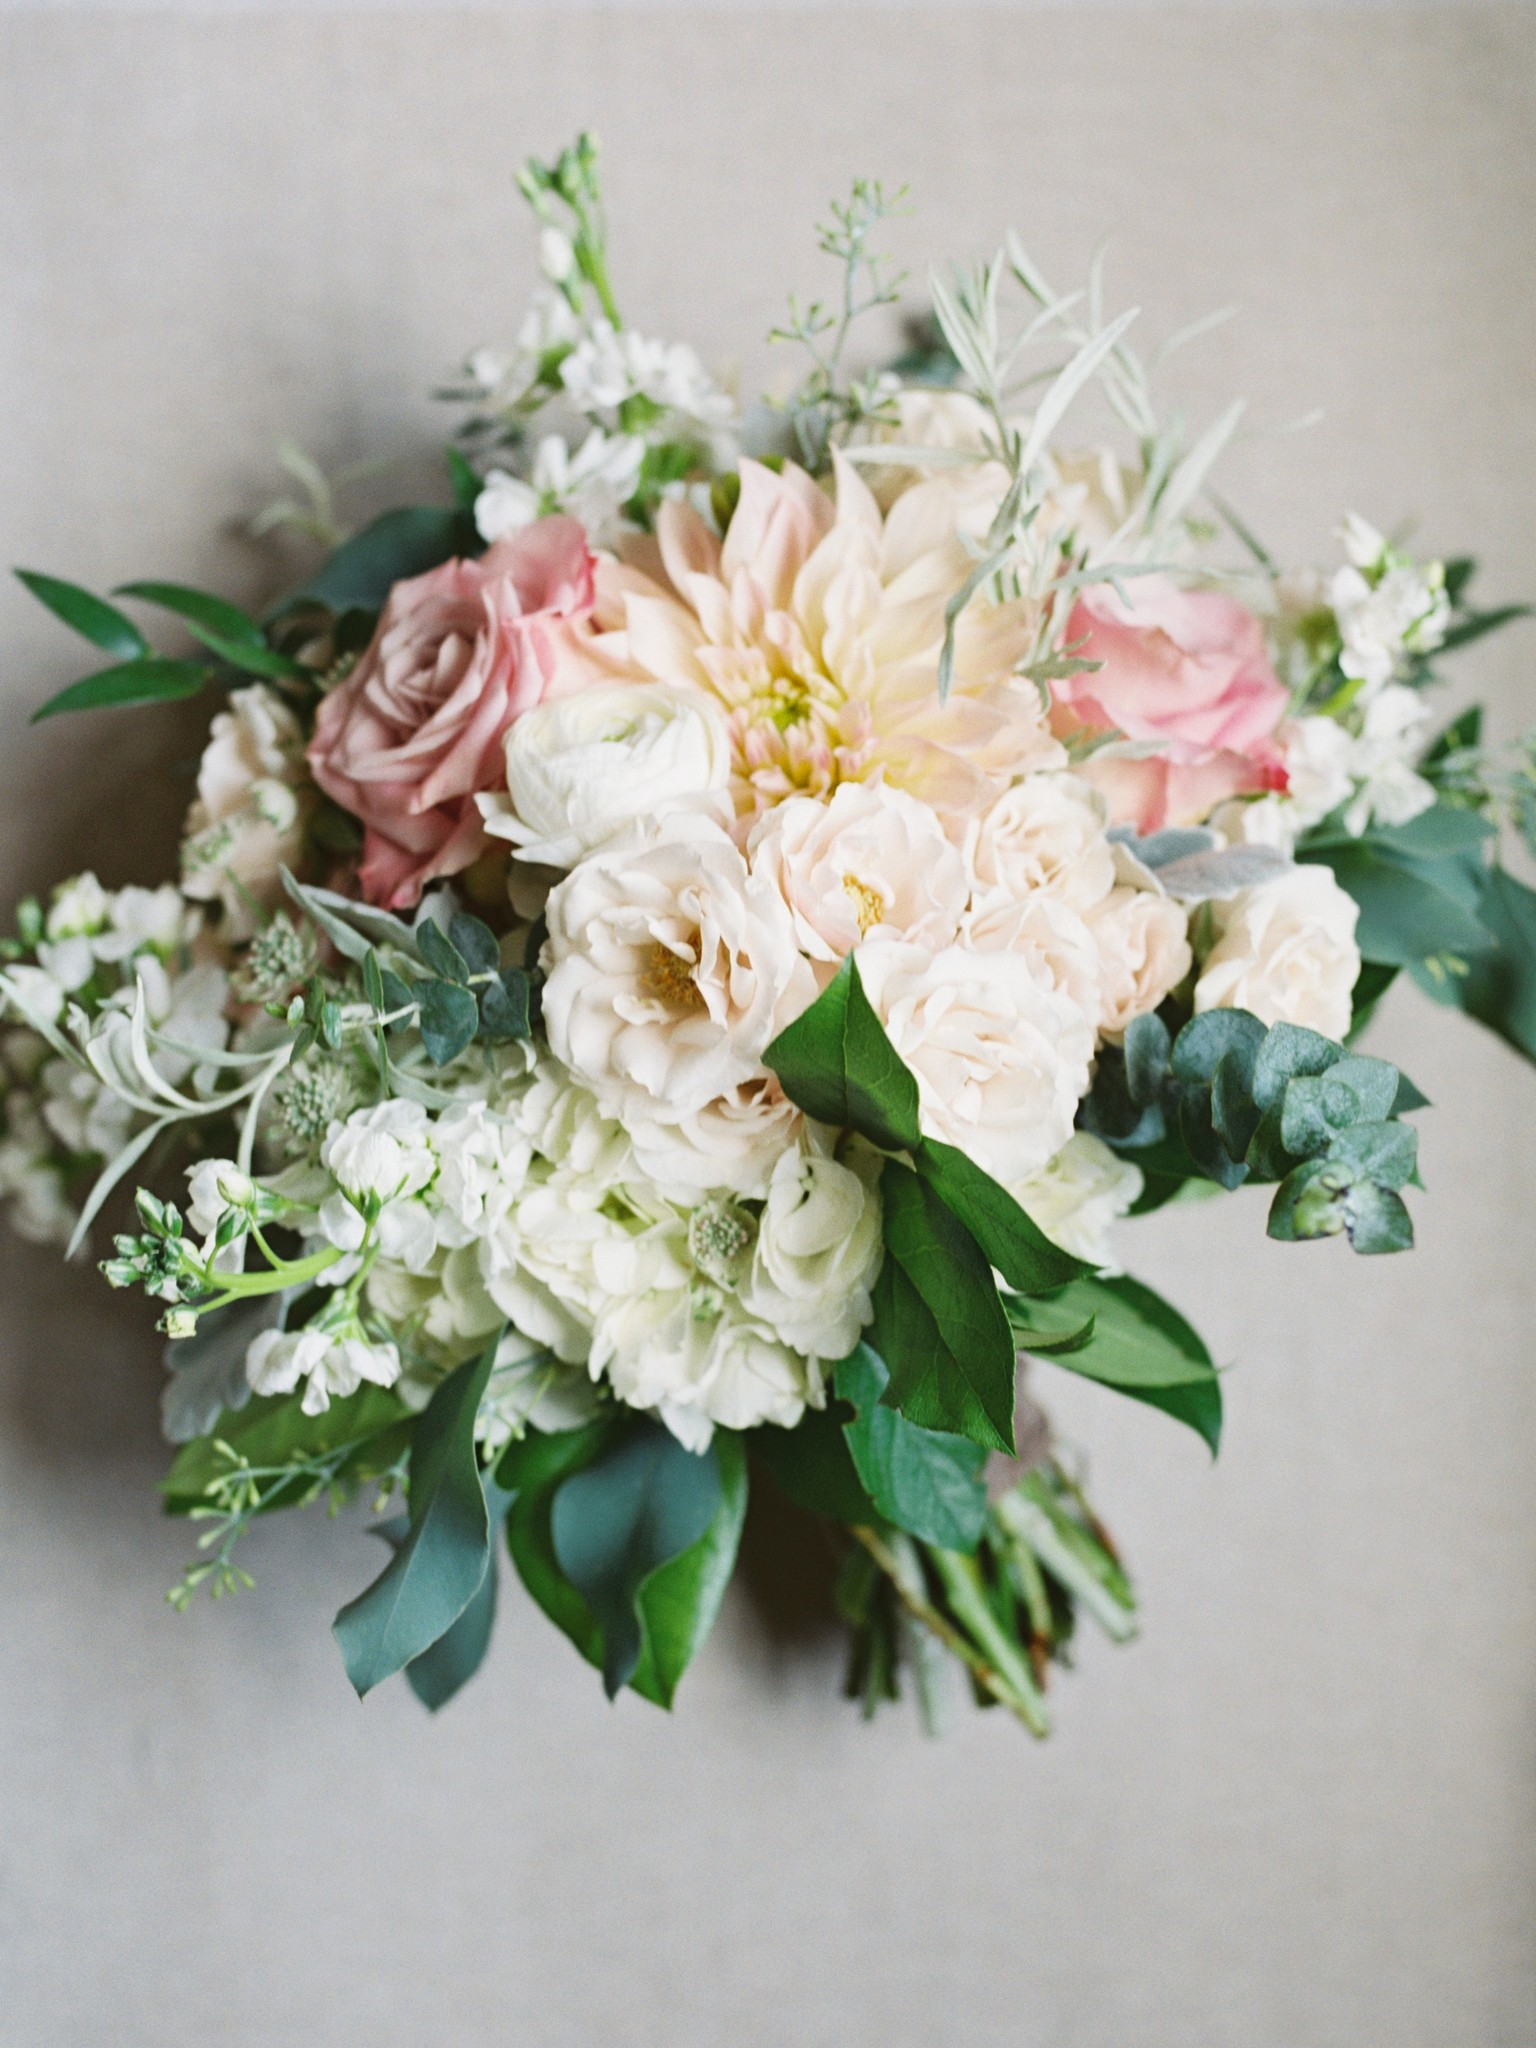 VA-Great-Marsh-Estate-Summer-Wedding-Blush-1.jpg